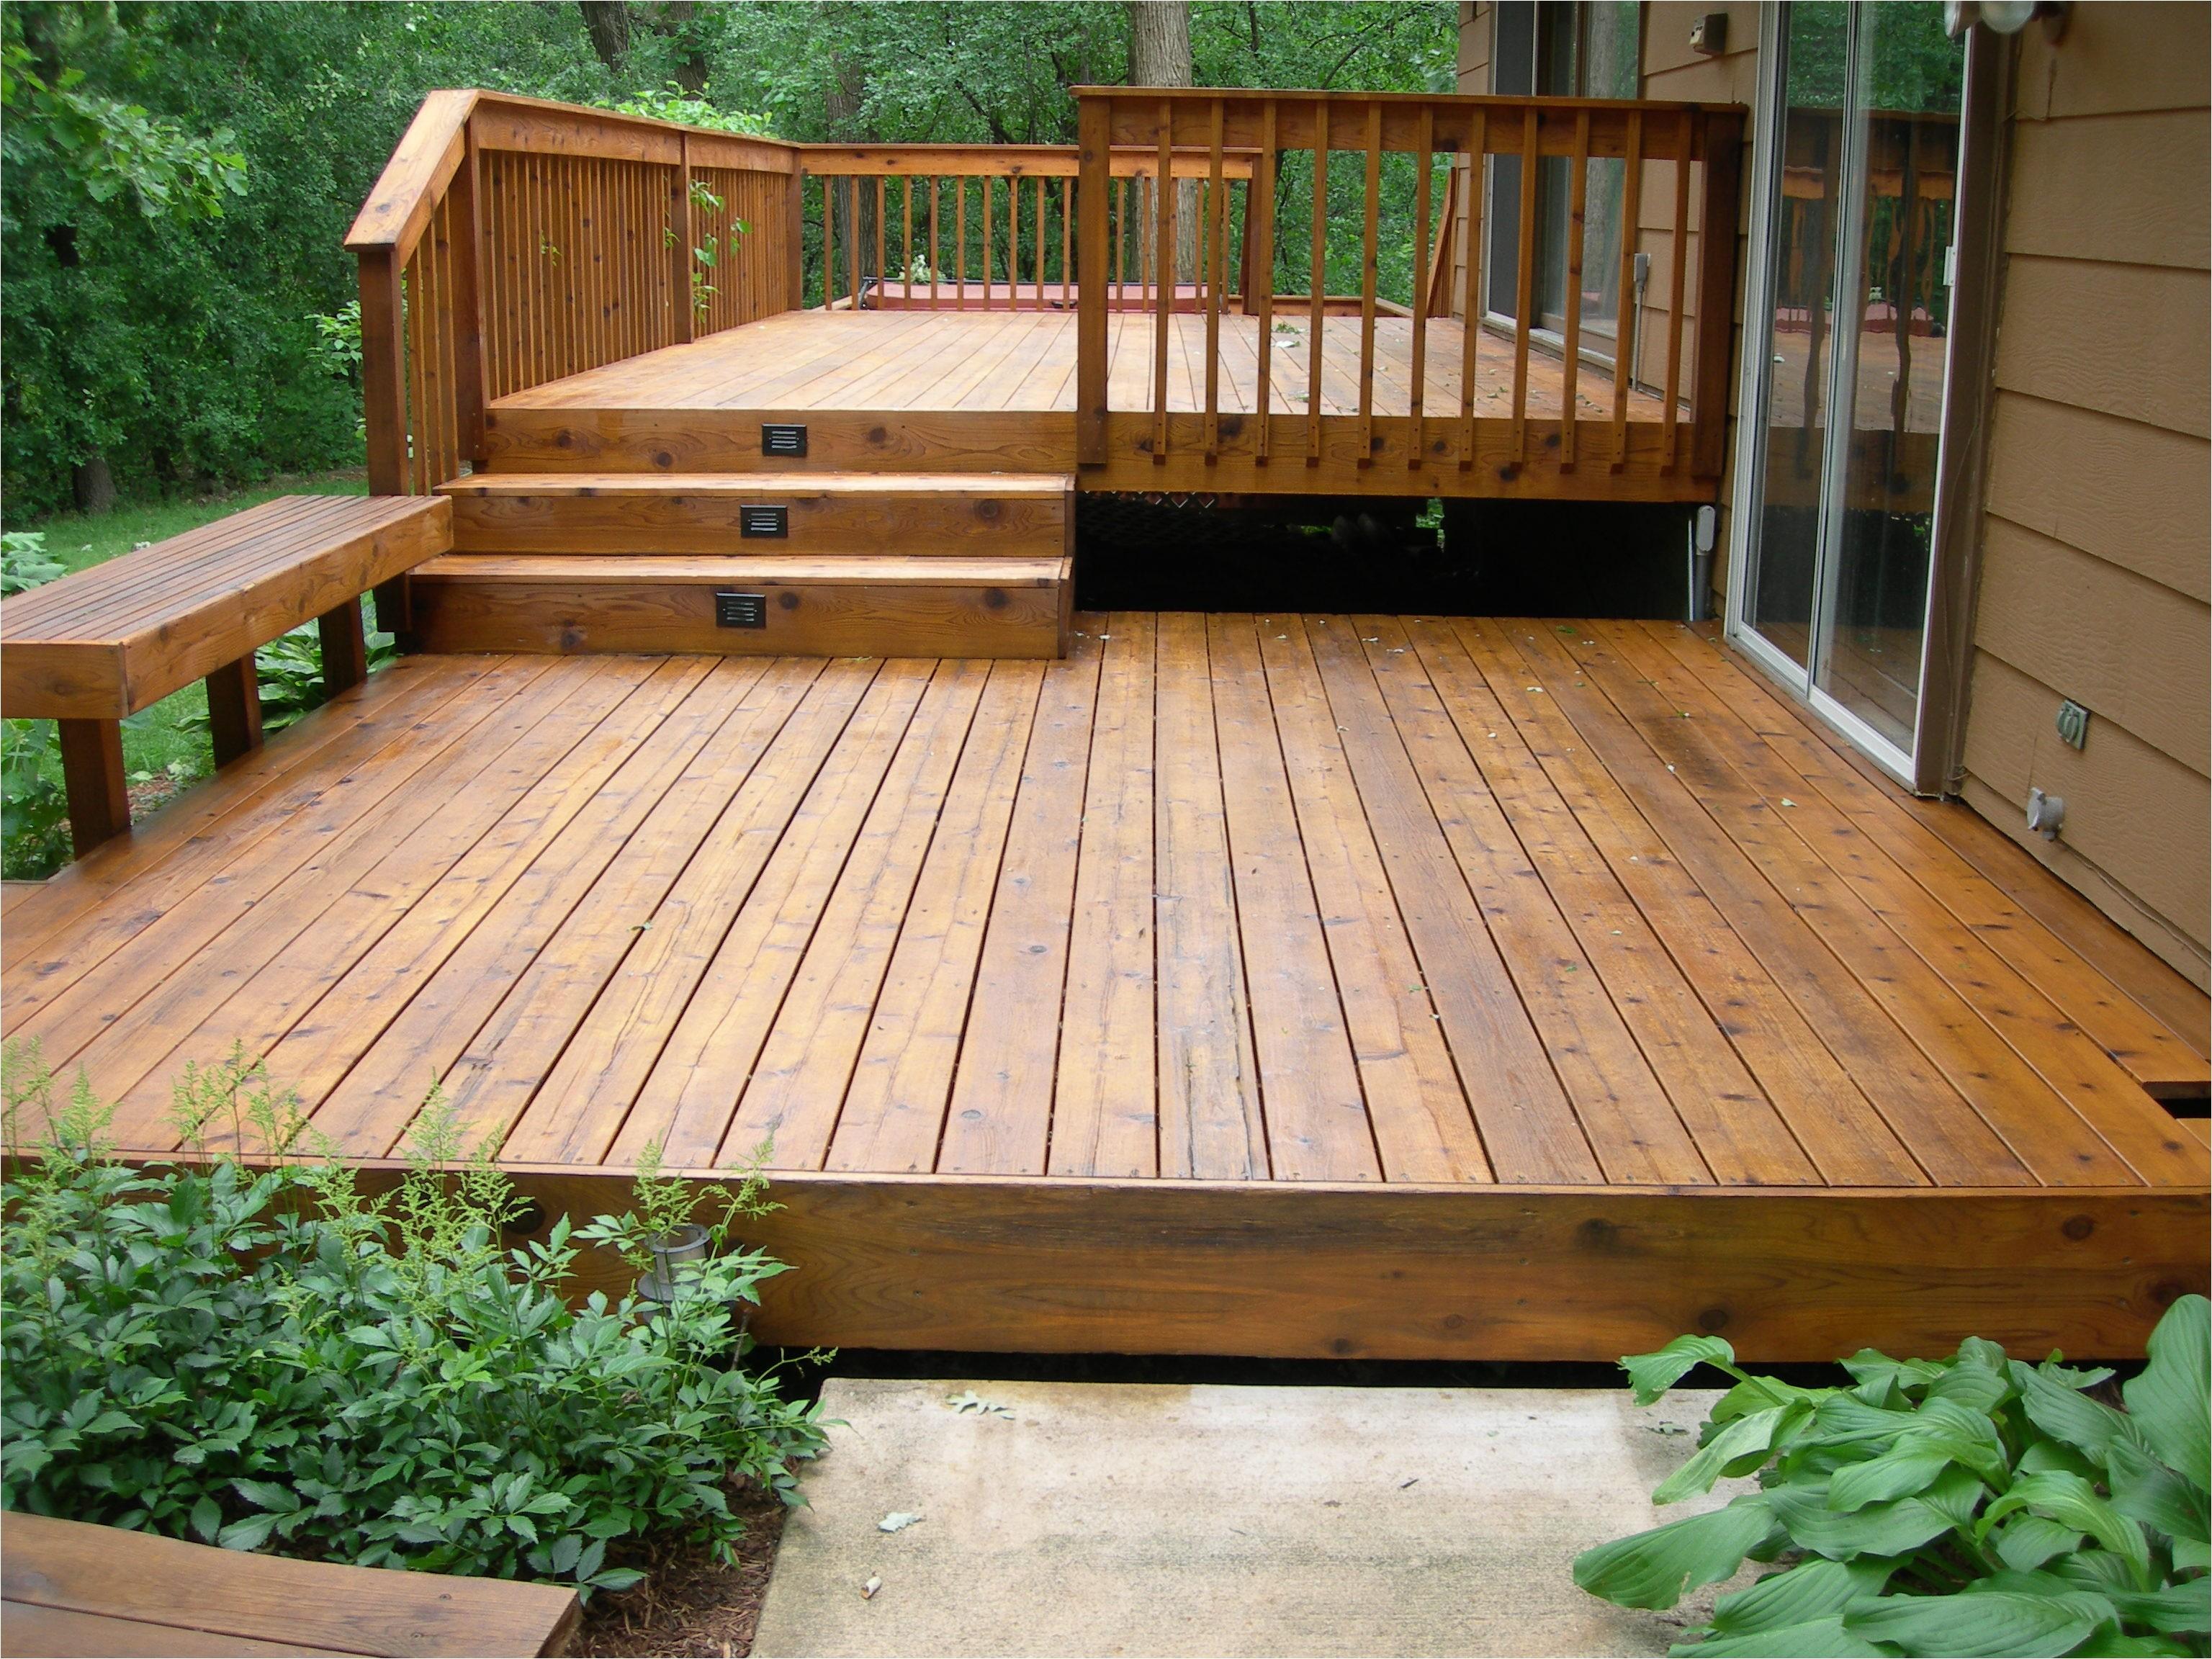 Free Deck Plans Home Depot Deck Stunning Ground Level Deck Plans for Inspiring